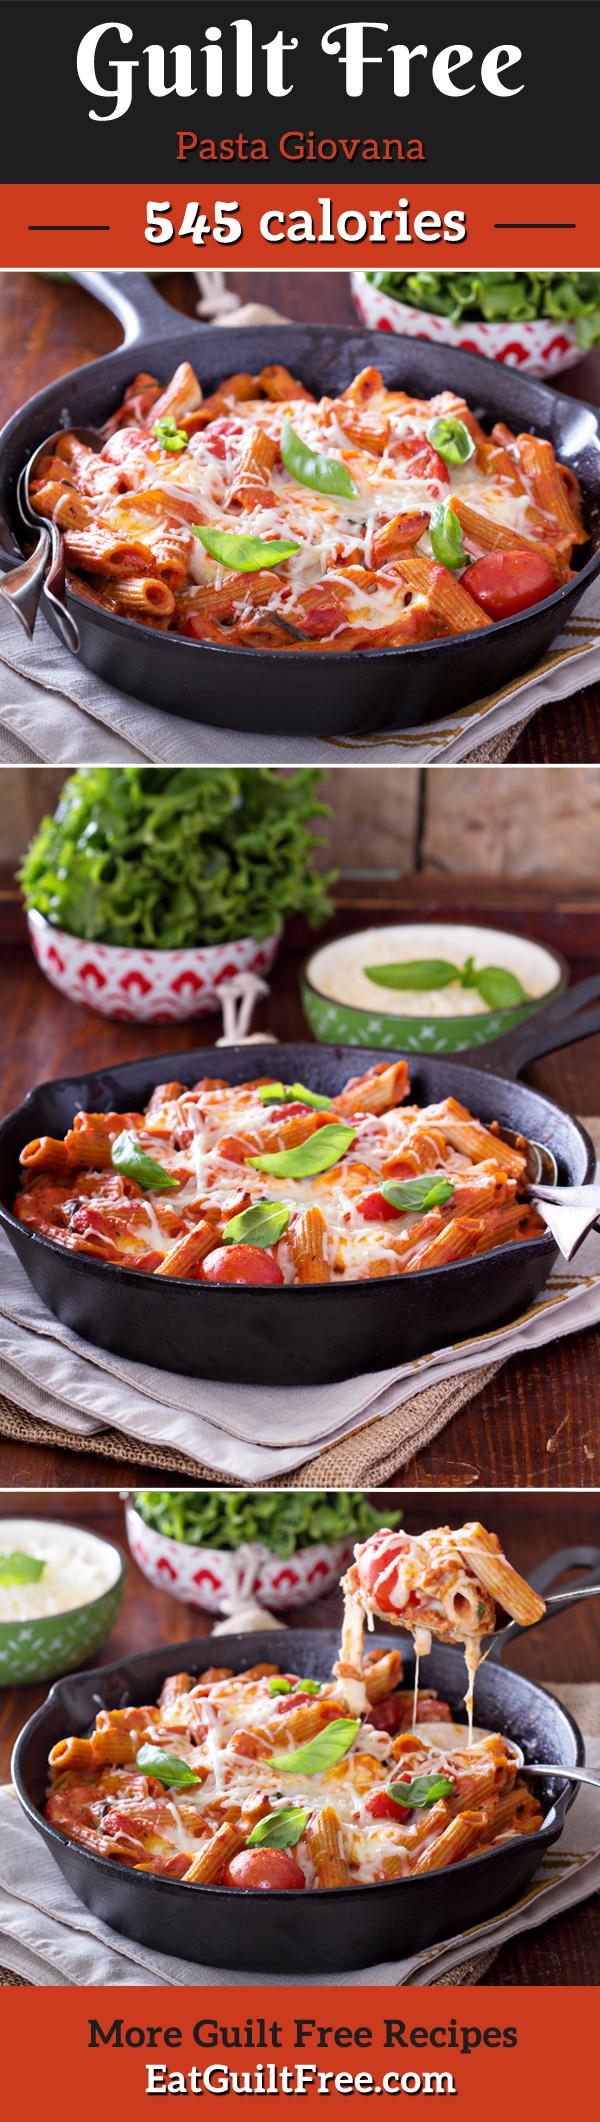 Guilt free #pasta Giovania recipe with homemade marinara sauce and melted mozzarella cheese.